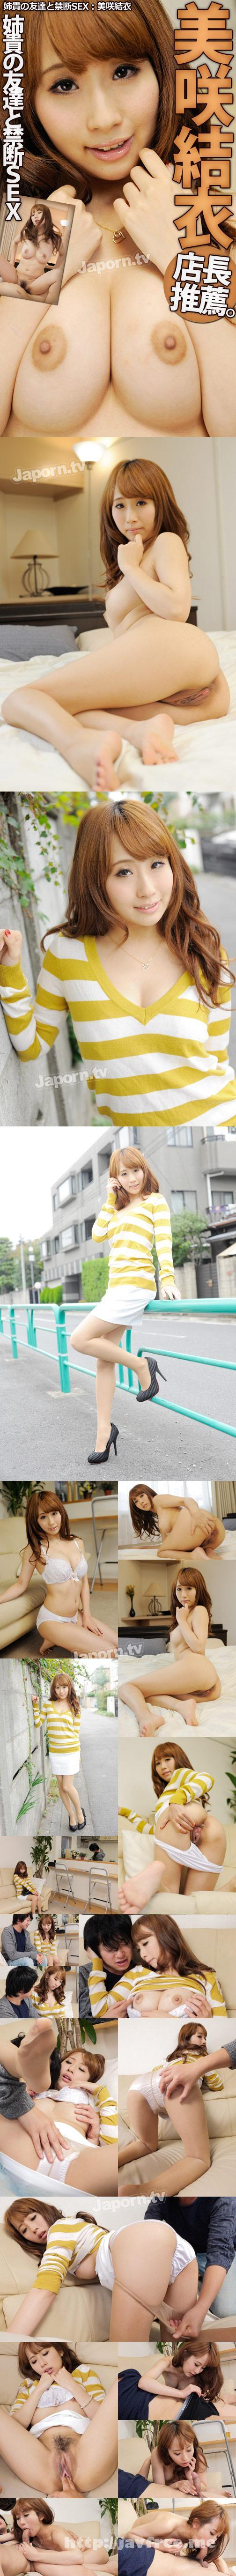 [DSAM 58] 姉貴の友達と禁断SEX : 美咲結衣 美咲結衣 Yui Misaki DSAM